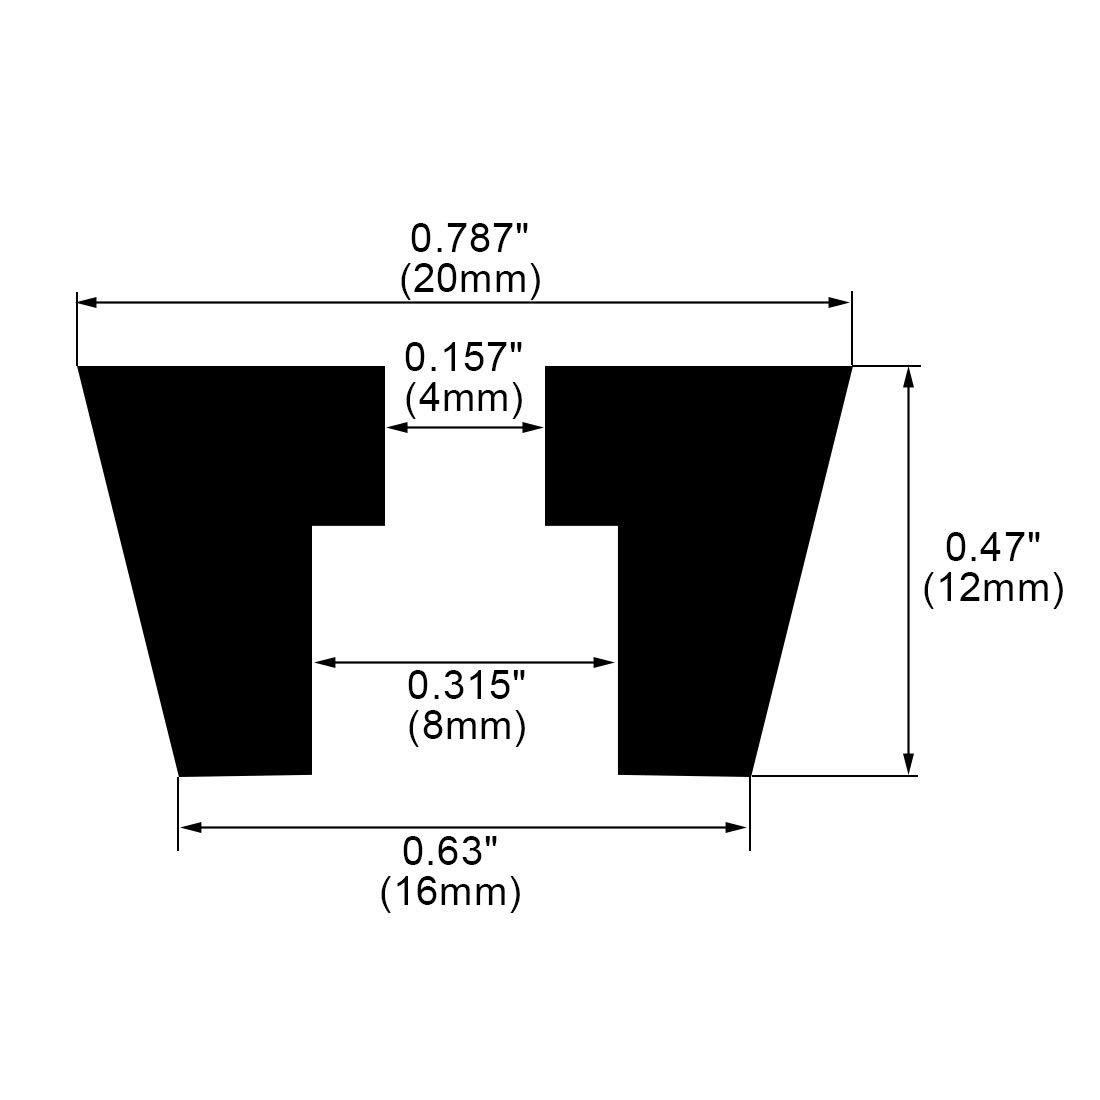 uxcell 6pcs Rubber Feet Bumpers Furniture Table Amplifier Speaker Cabinet Leg Pads D31x29xH22mm